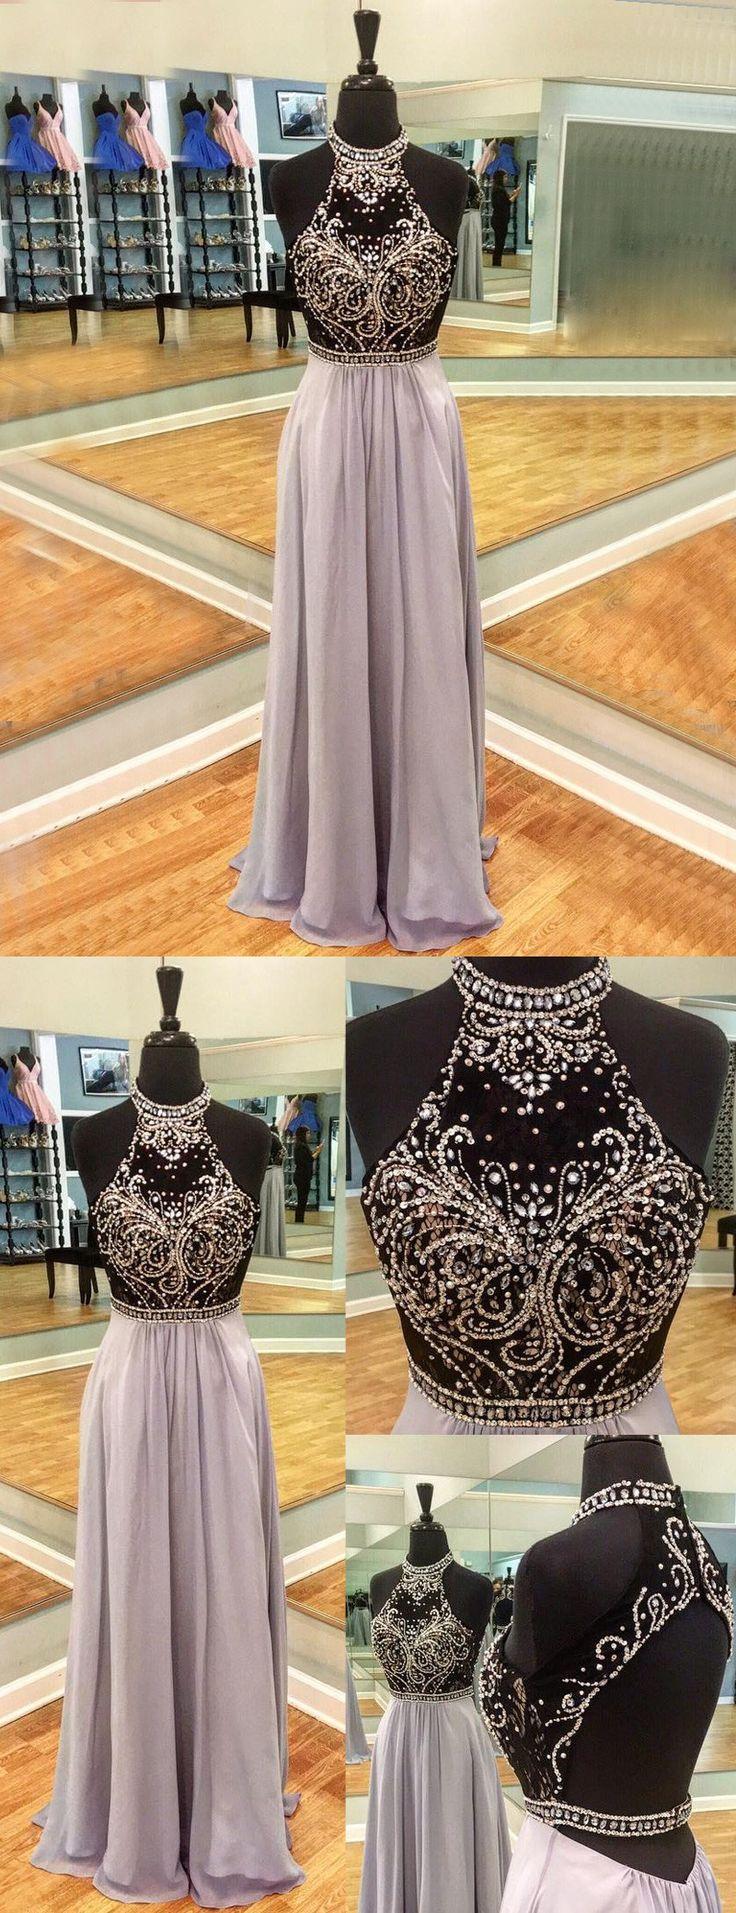 2017 long prom dresses, long evening dresses, long formal prom dresses, sexy prom dresses, open back prom dresses